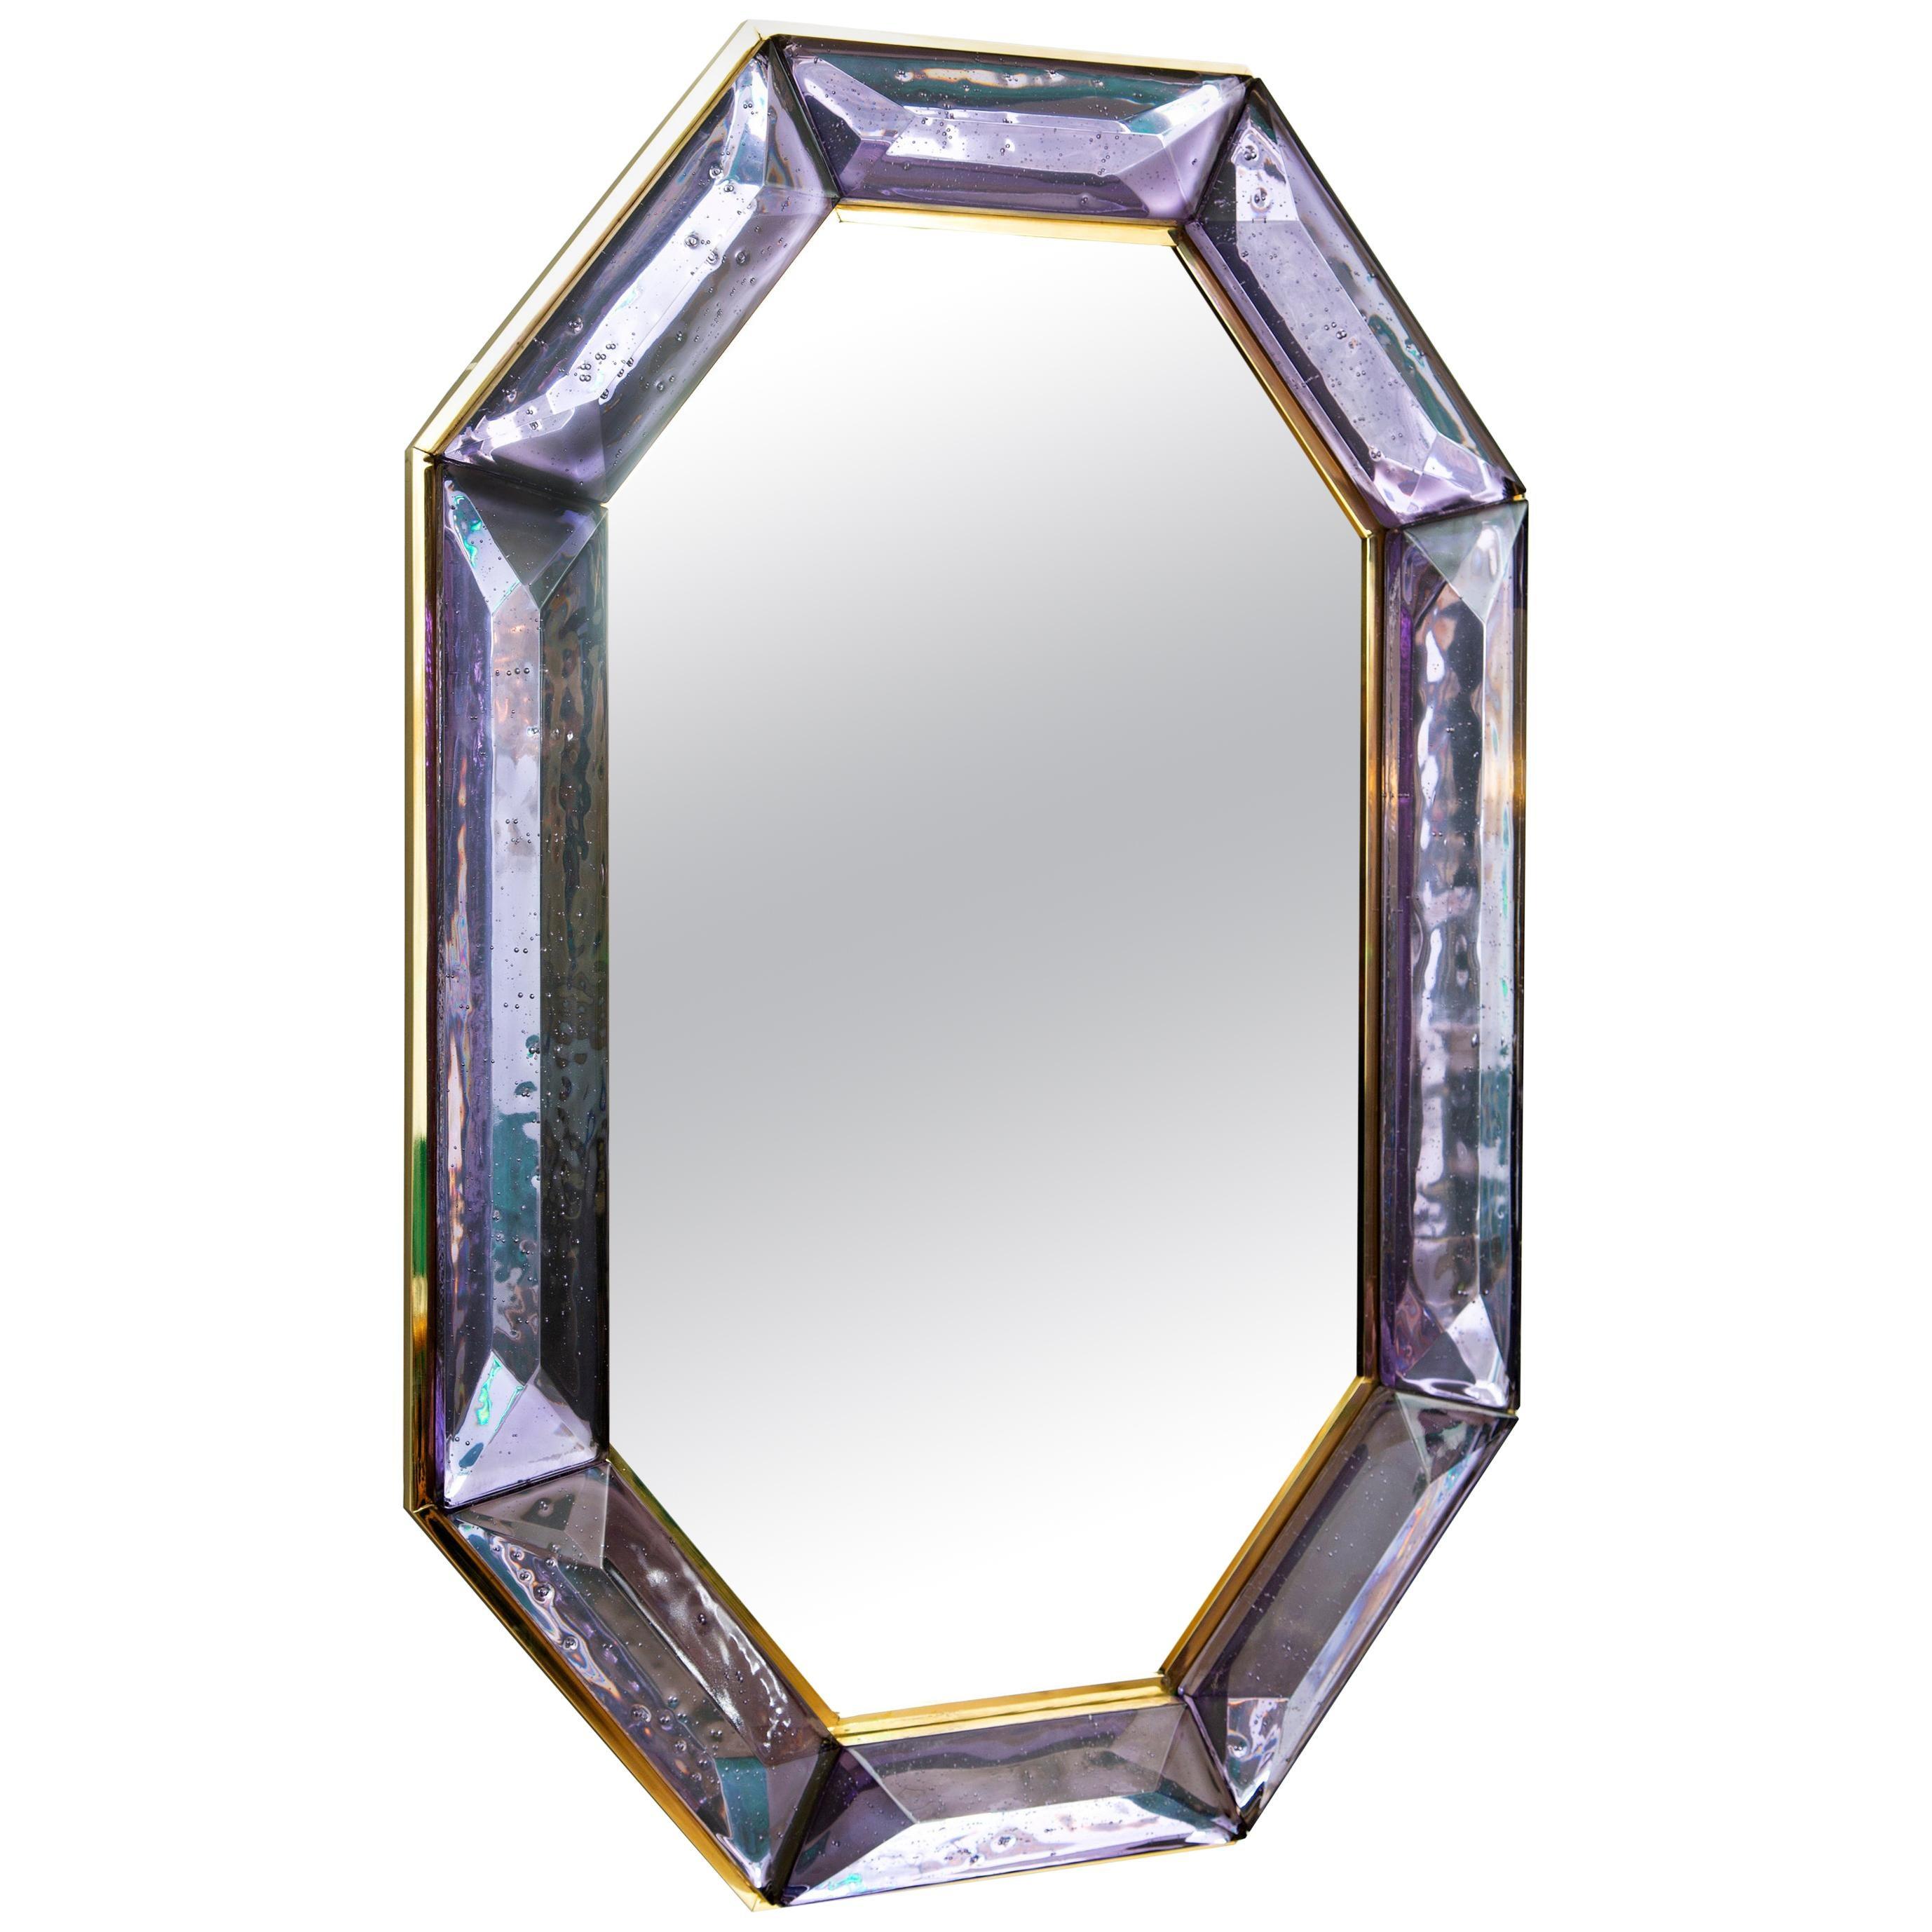 Bespoke Octagon Amethyst Murano Glass Mirror, in Stock